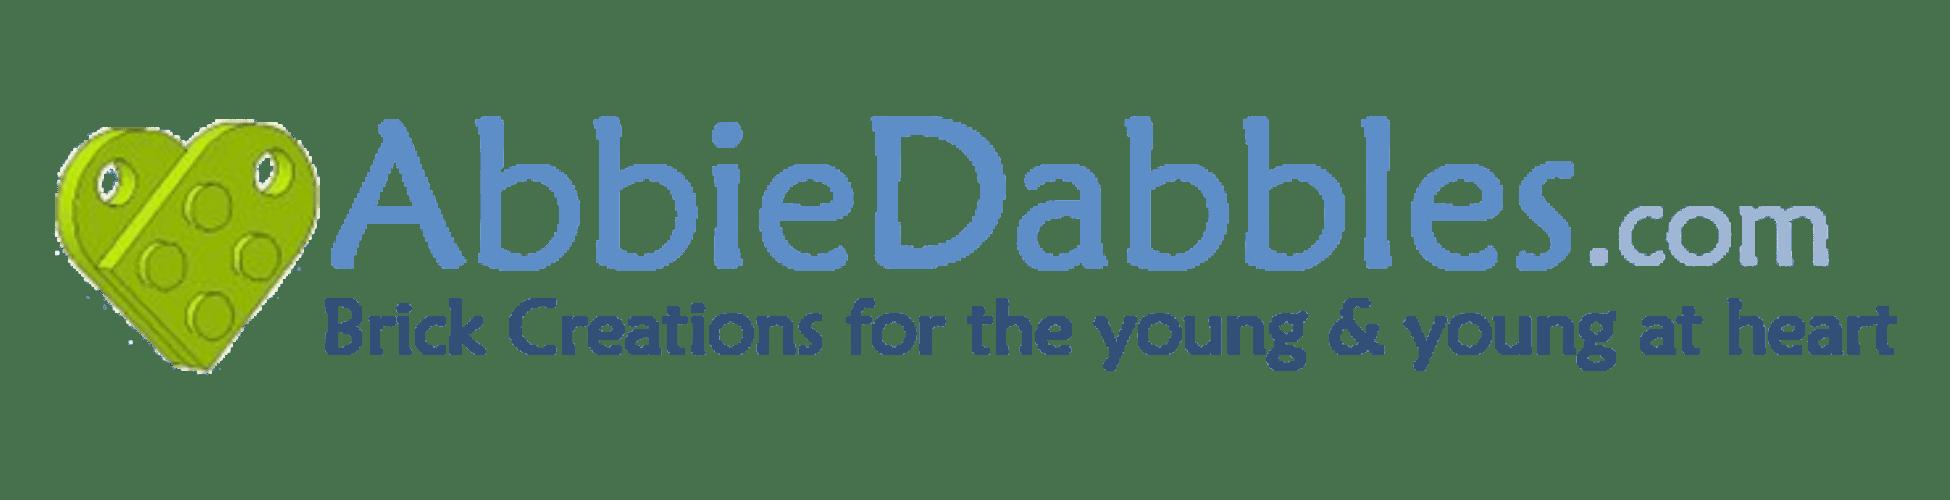 AbbieDabbles trans 1950x500